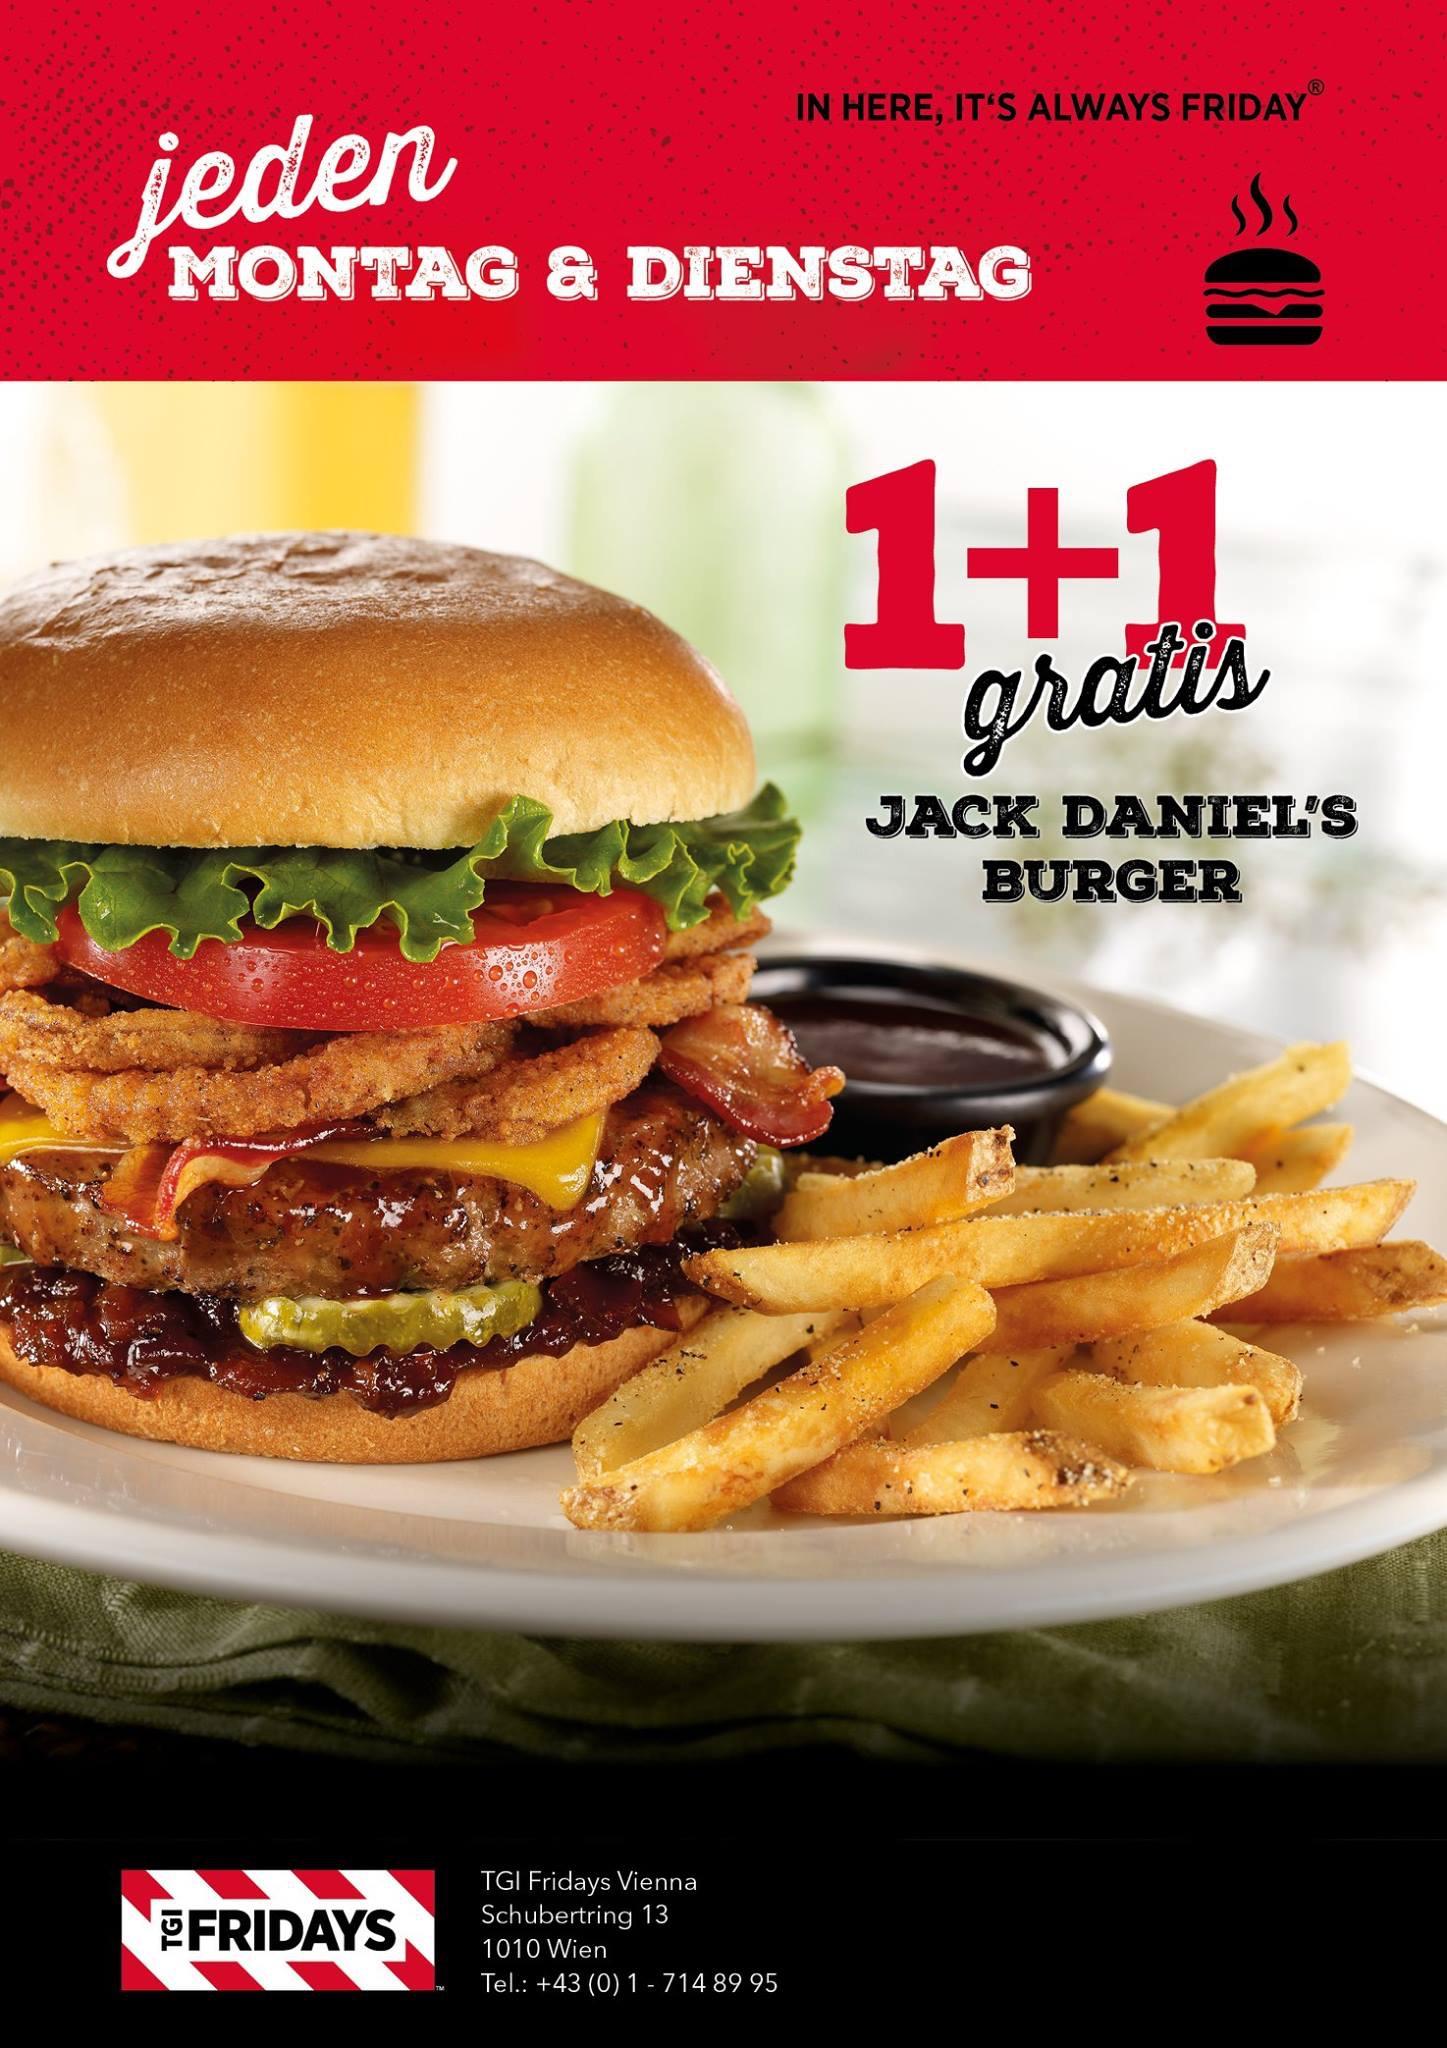 "TGI Fridays Wien: 1+1 Gratis ""Jack Daniels"" Burger (jeden MO+DI)"